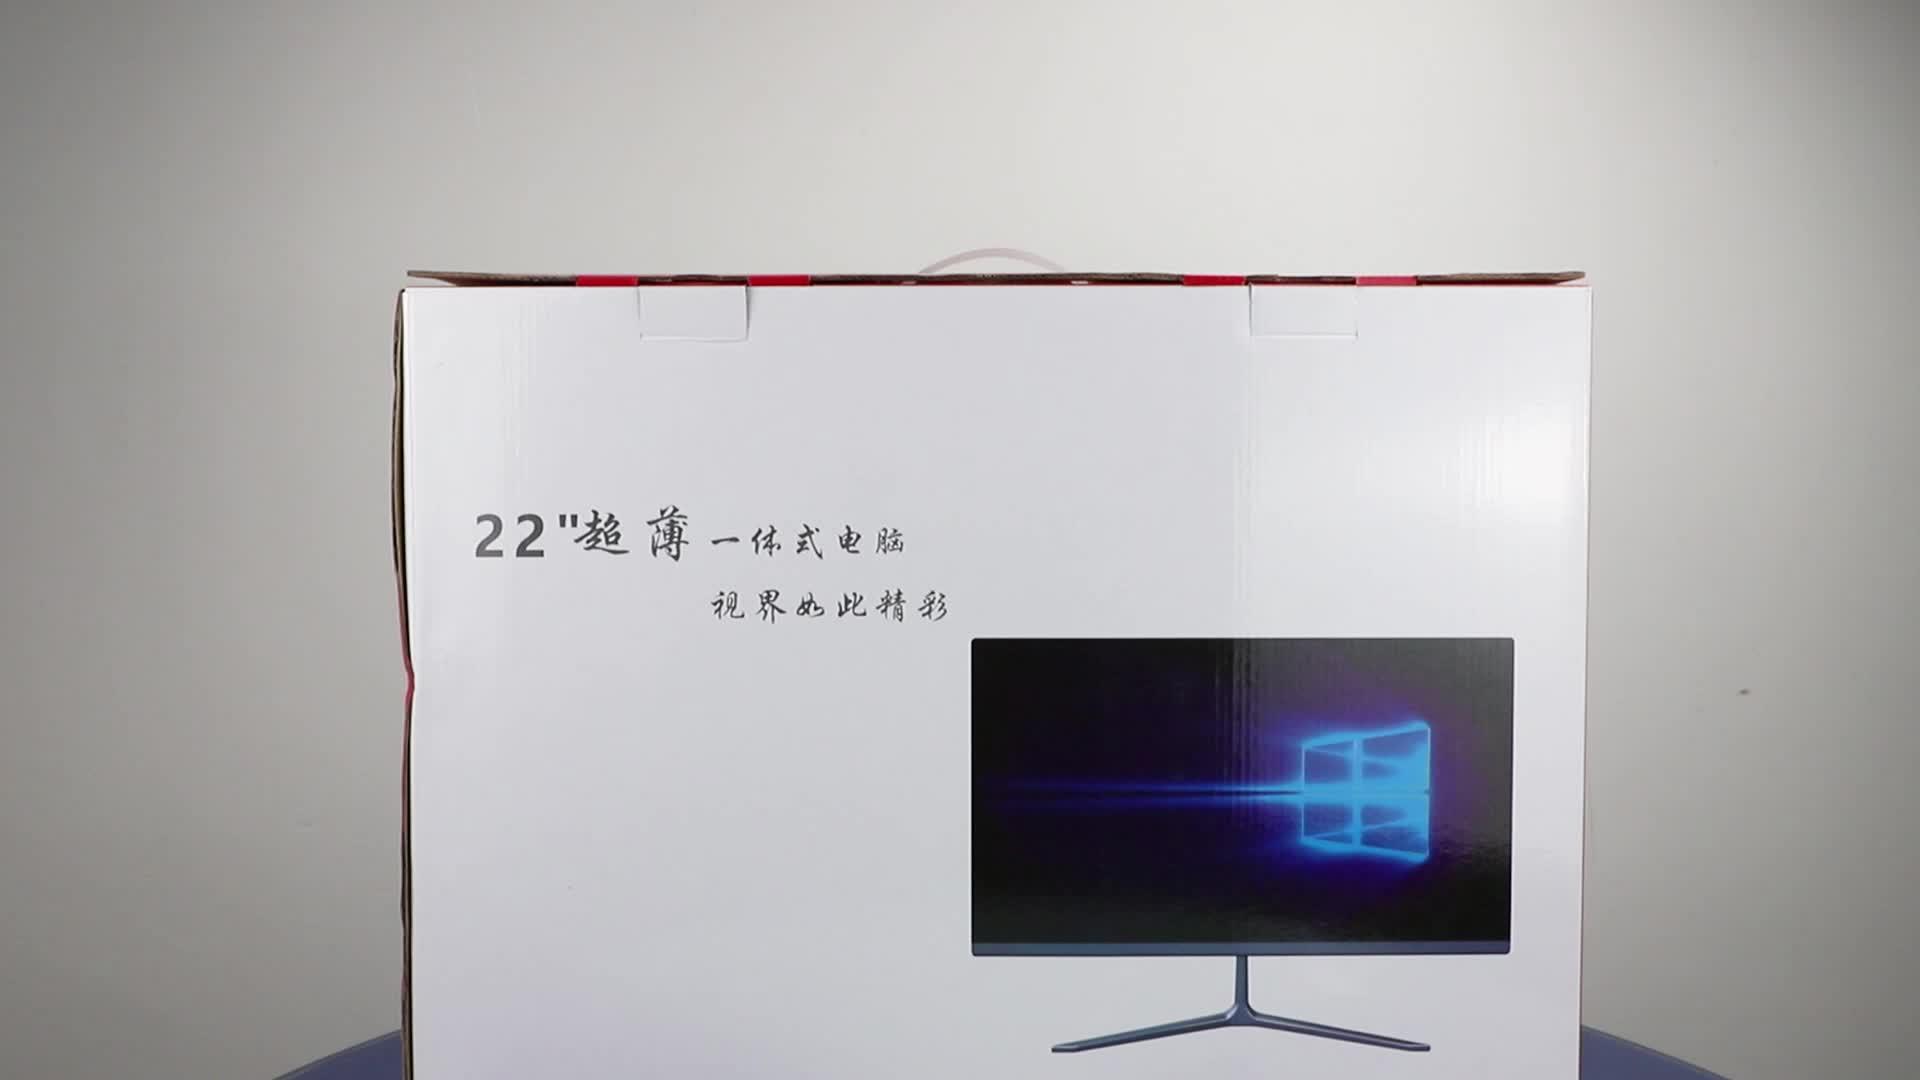 Sharerdp オールインワンデスクトップ pc J1900 とタッチスクリーン